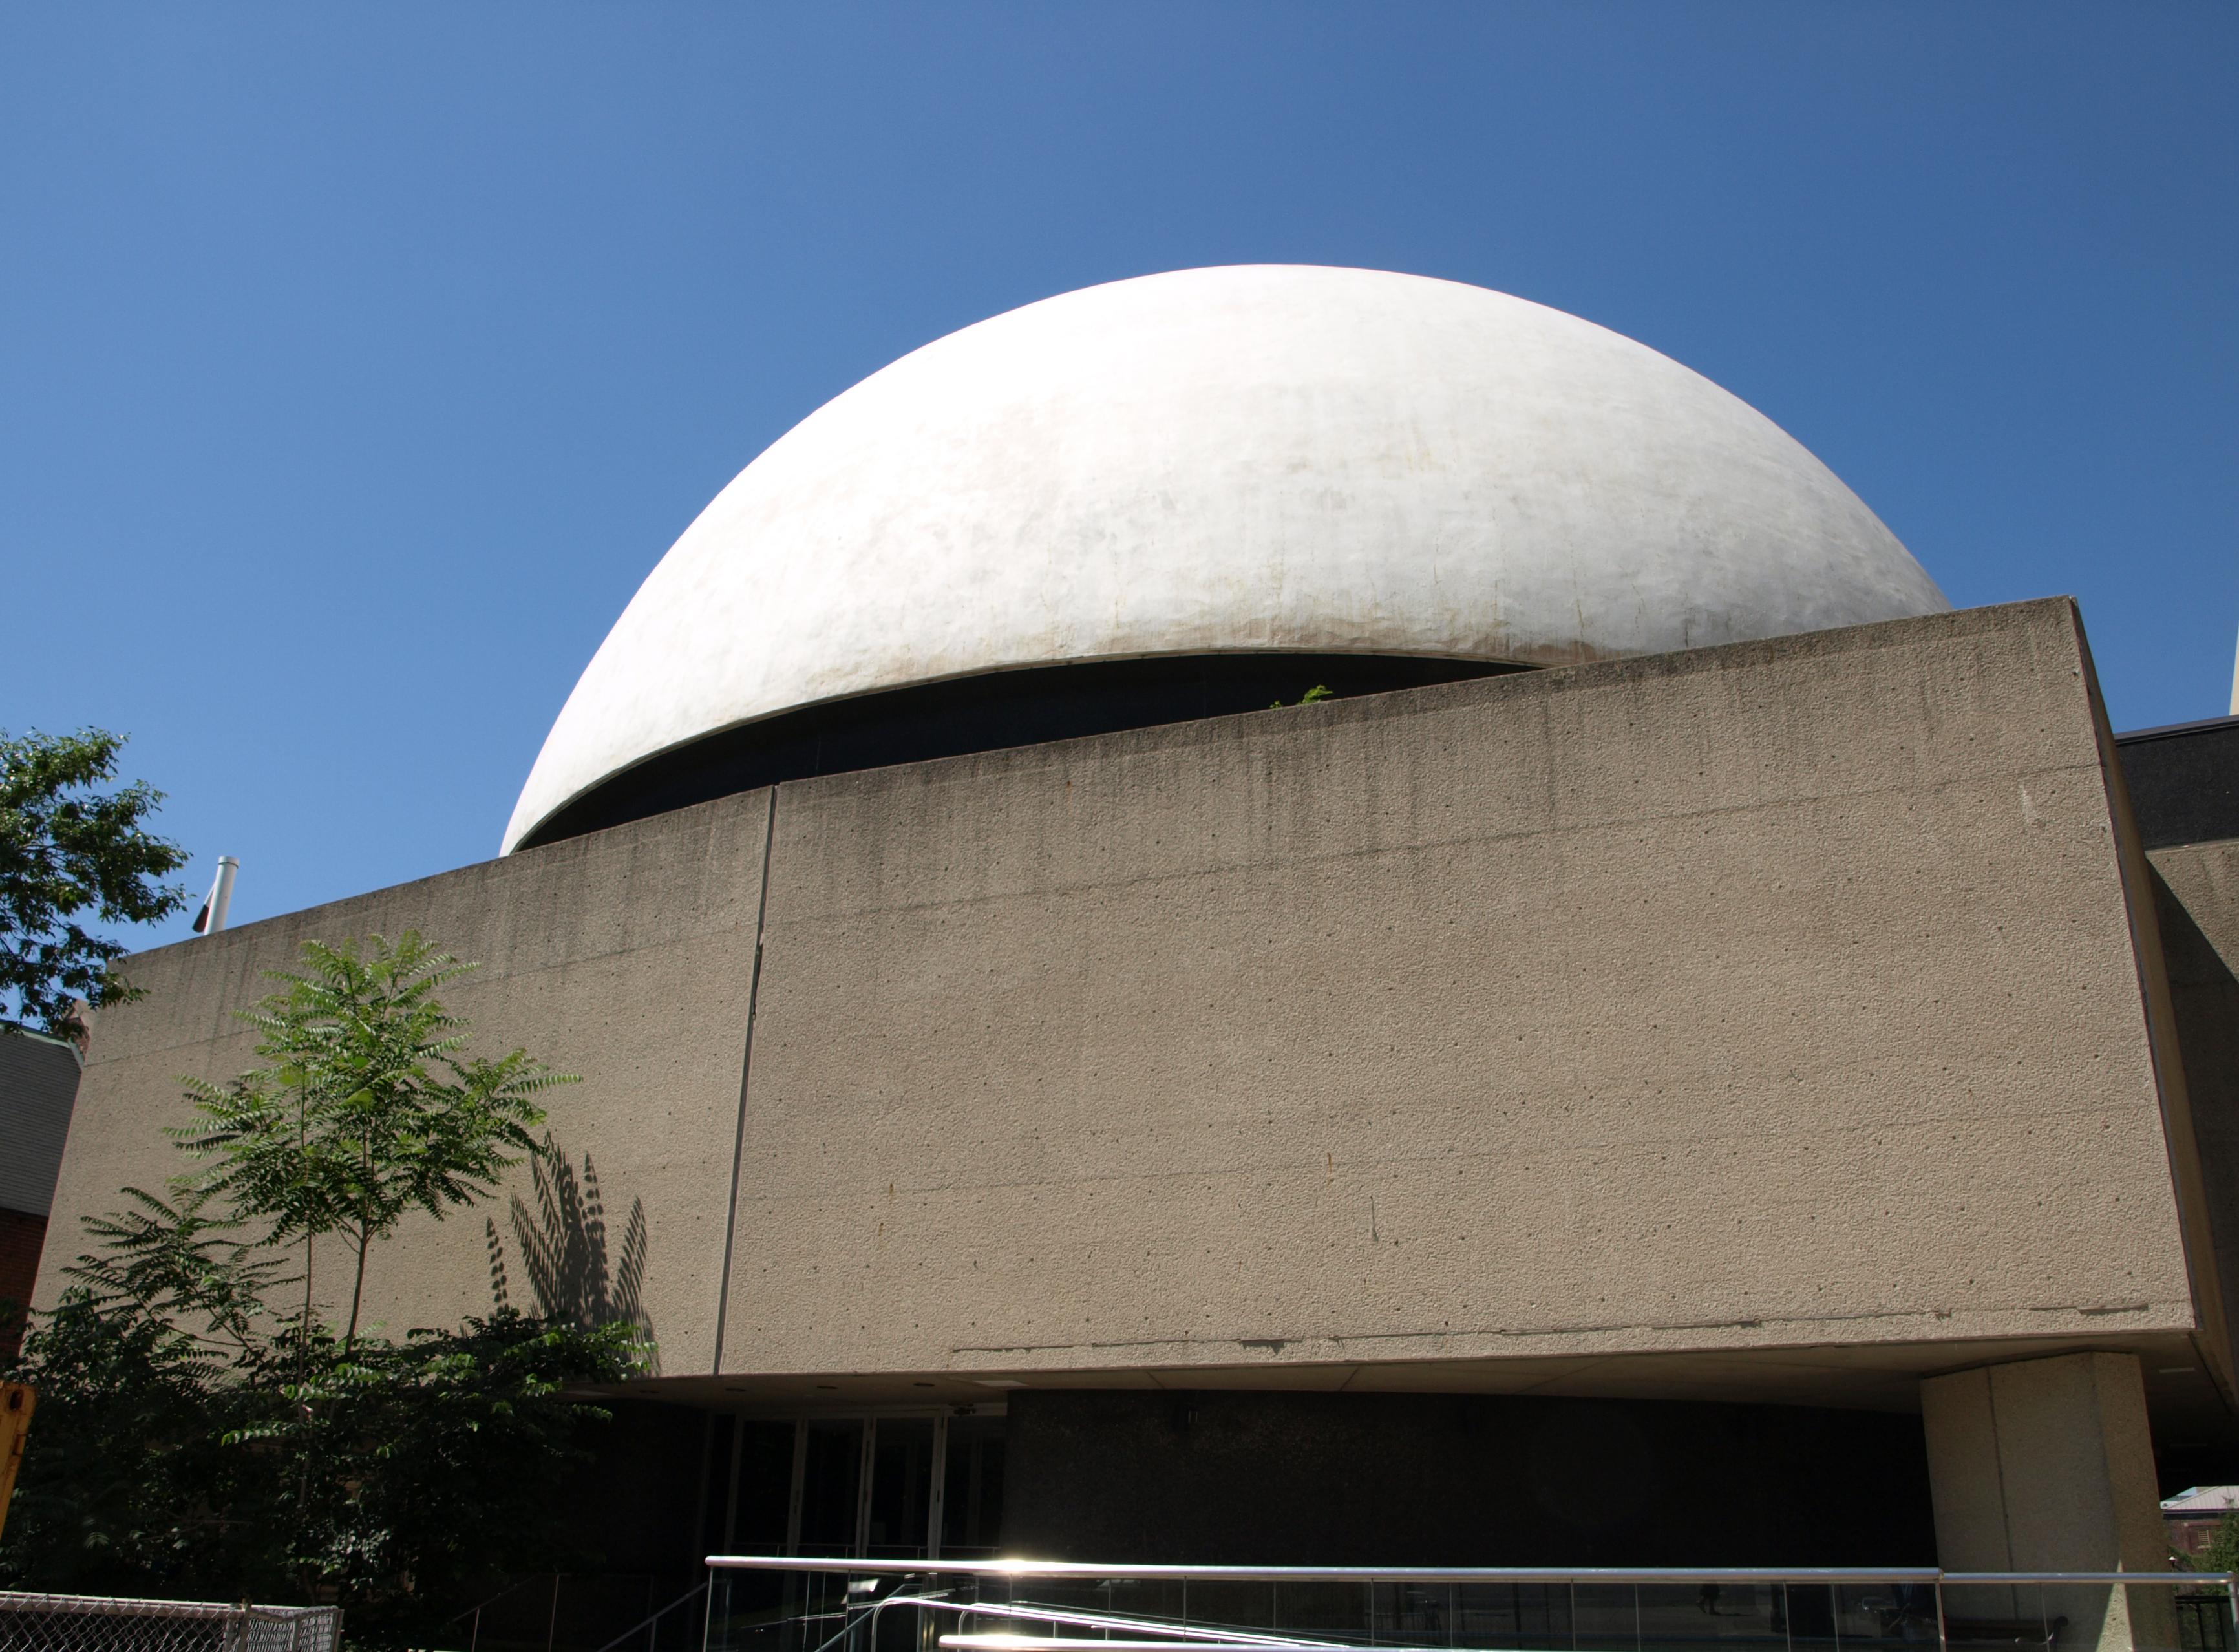 McLaughlin Planetarium - Wikipedia